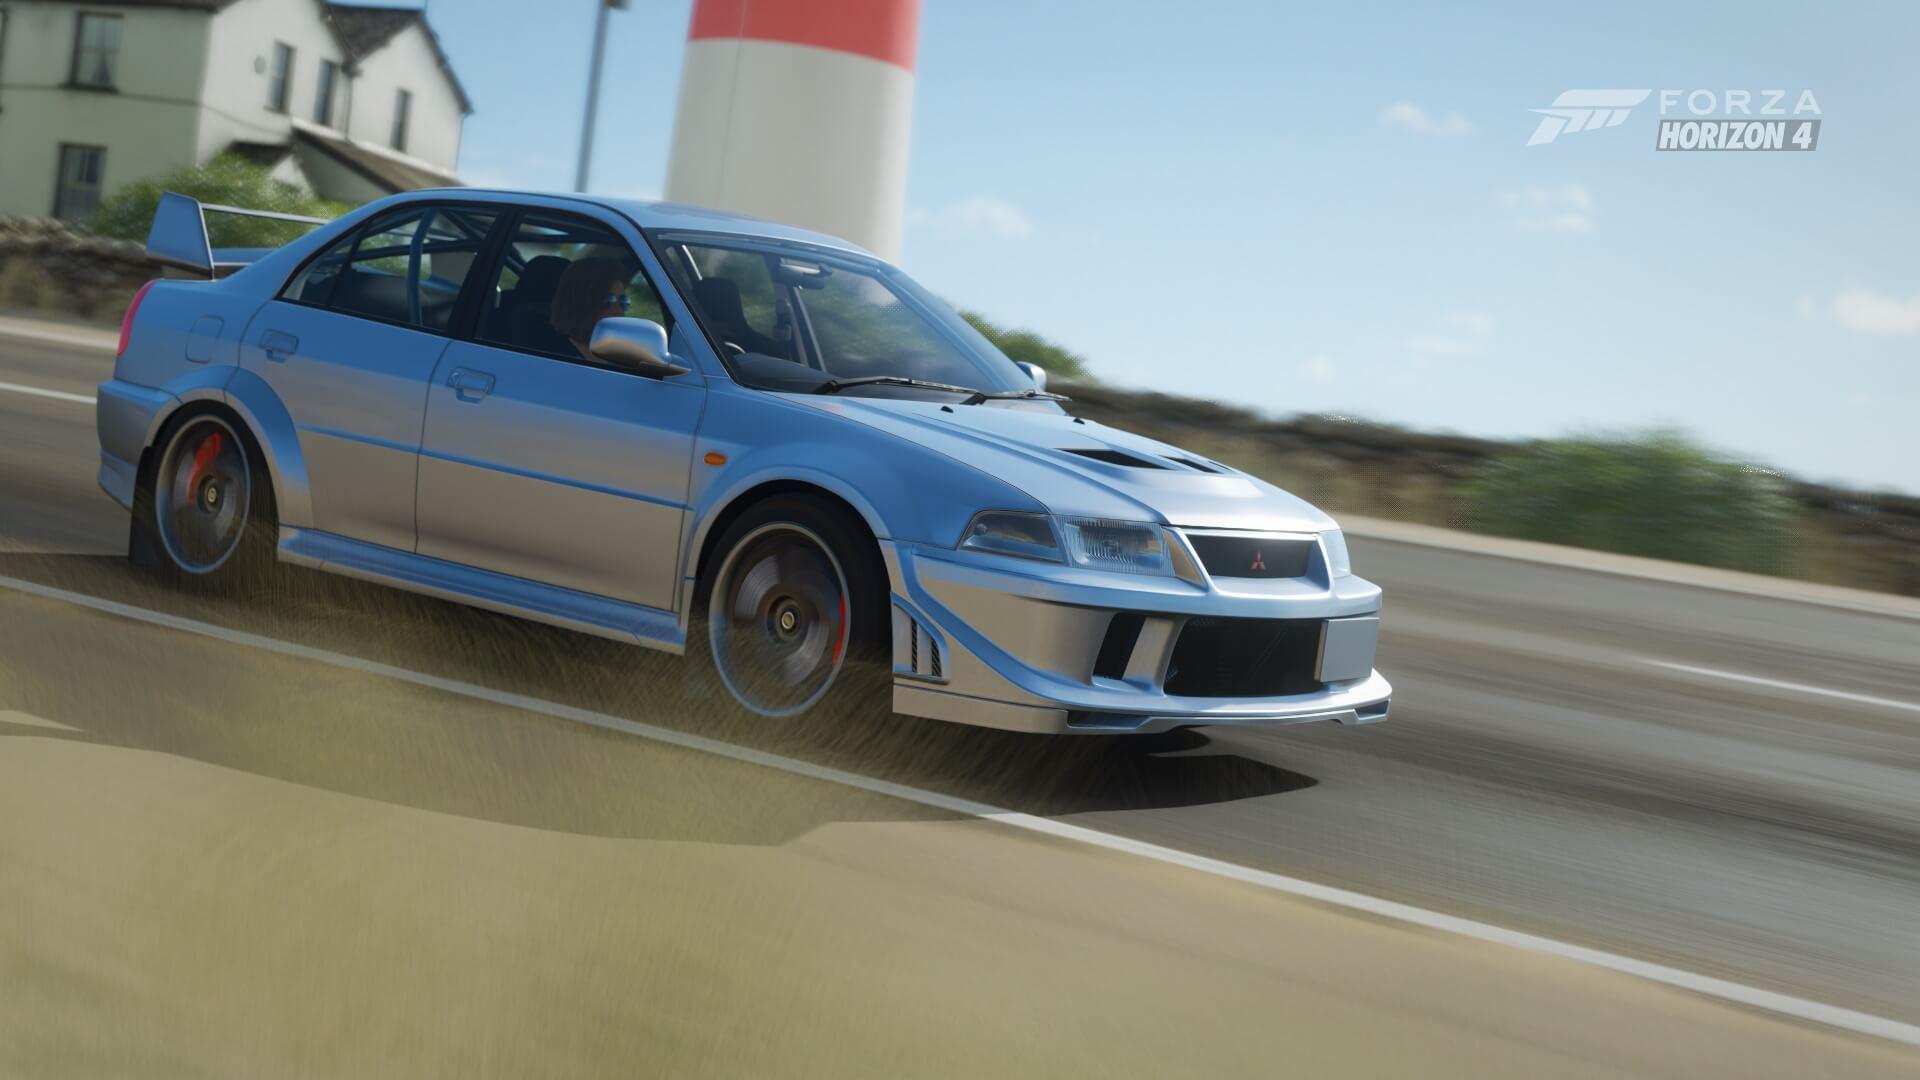 Forza Horizon 4 Season 5 Update Now Available: Mitsubishis, New